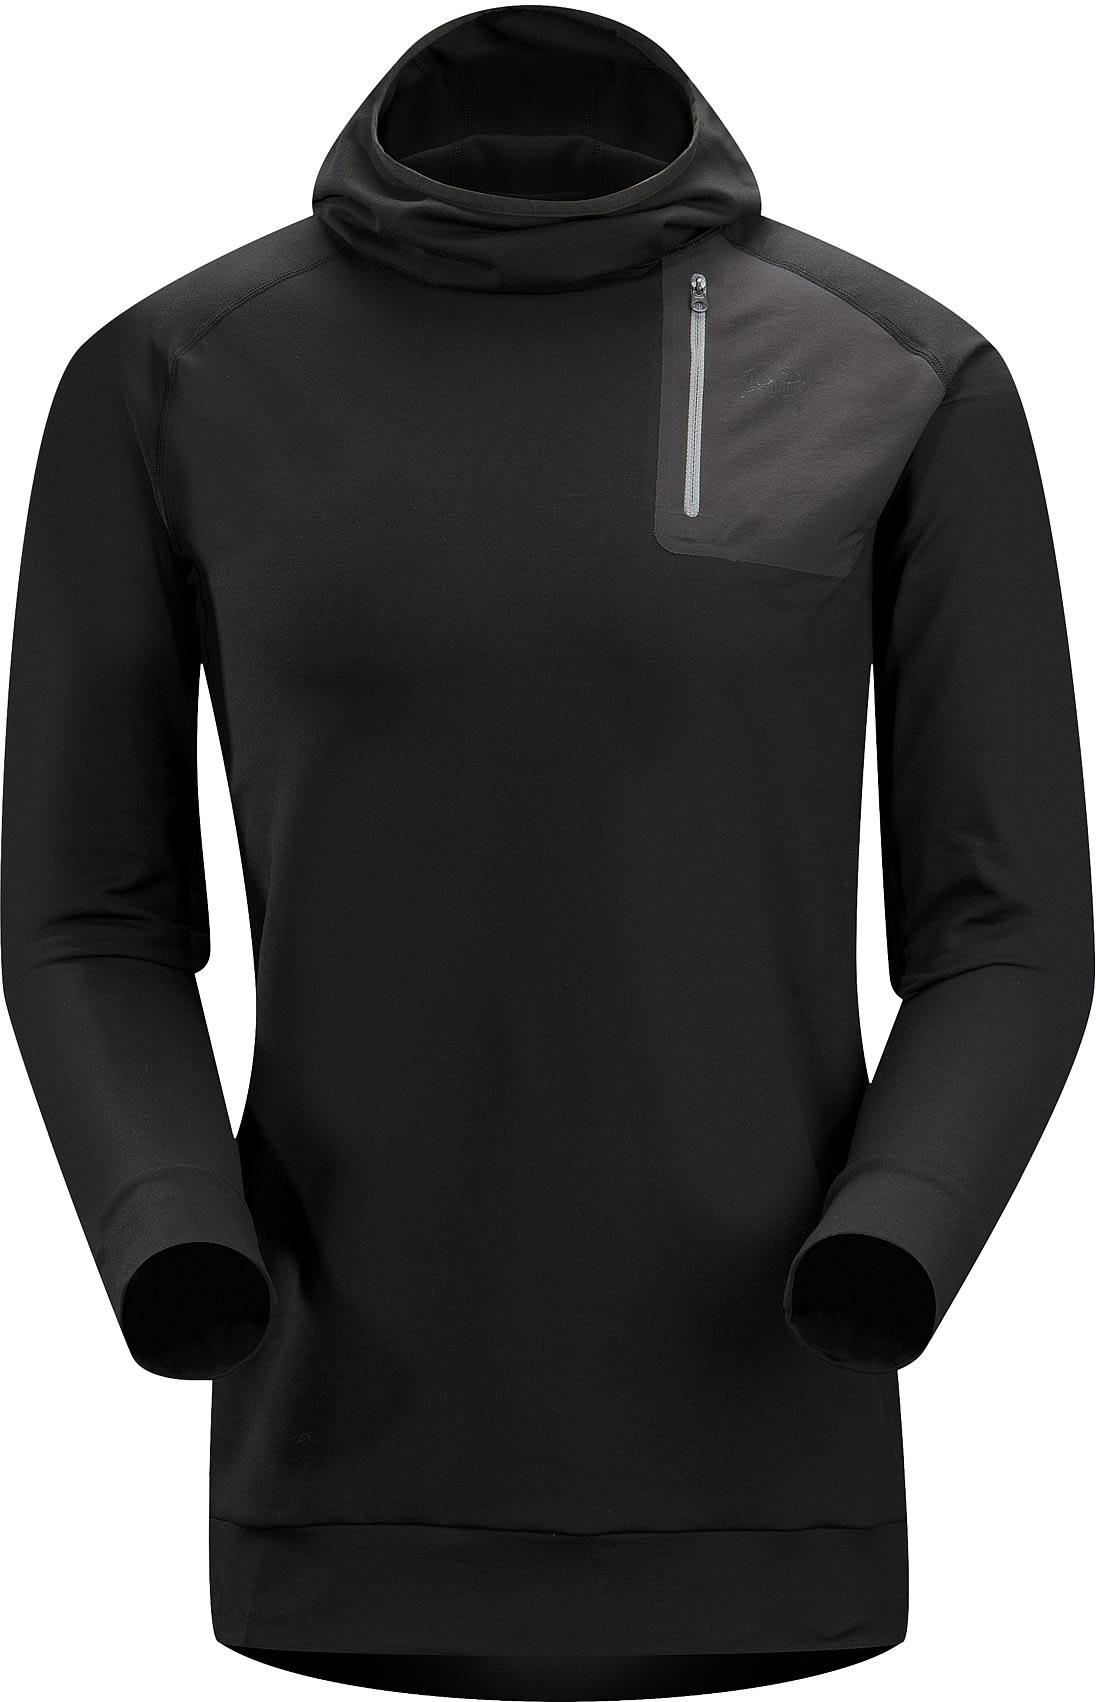 Base layer hoodie